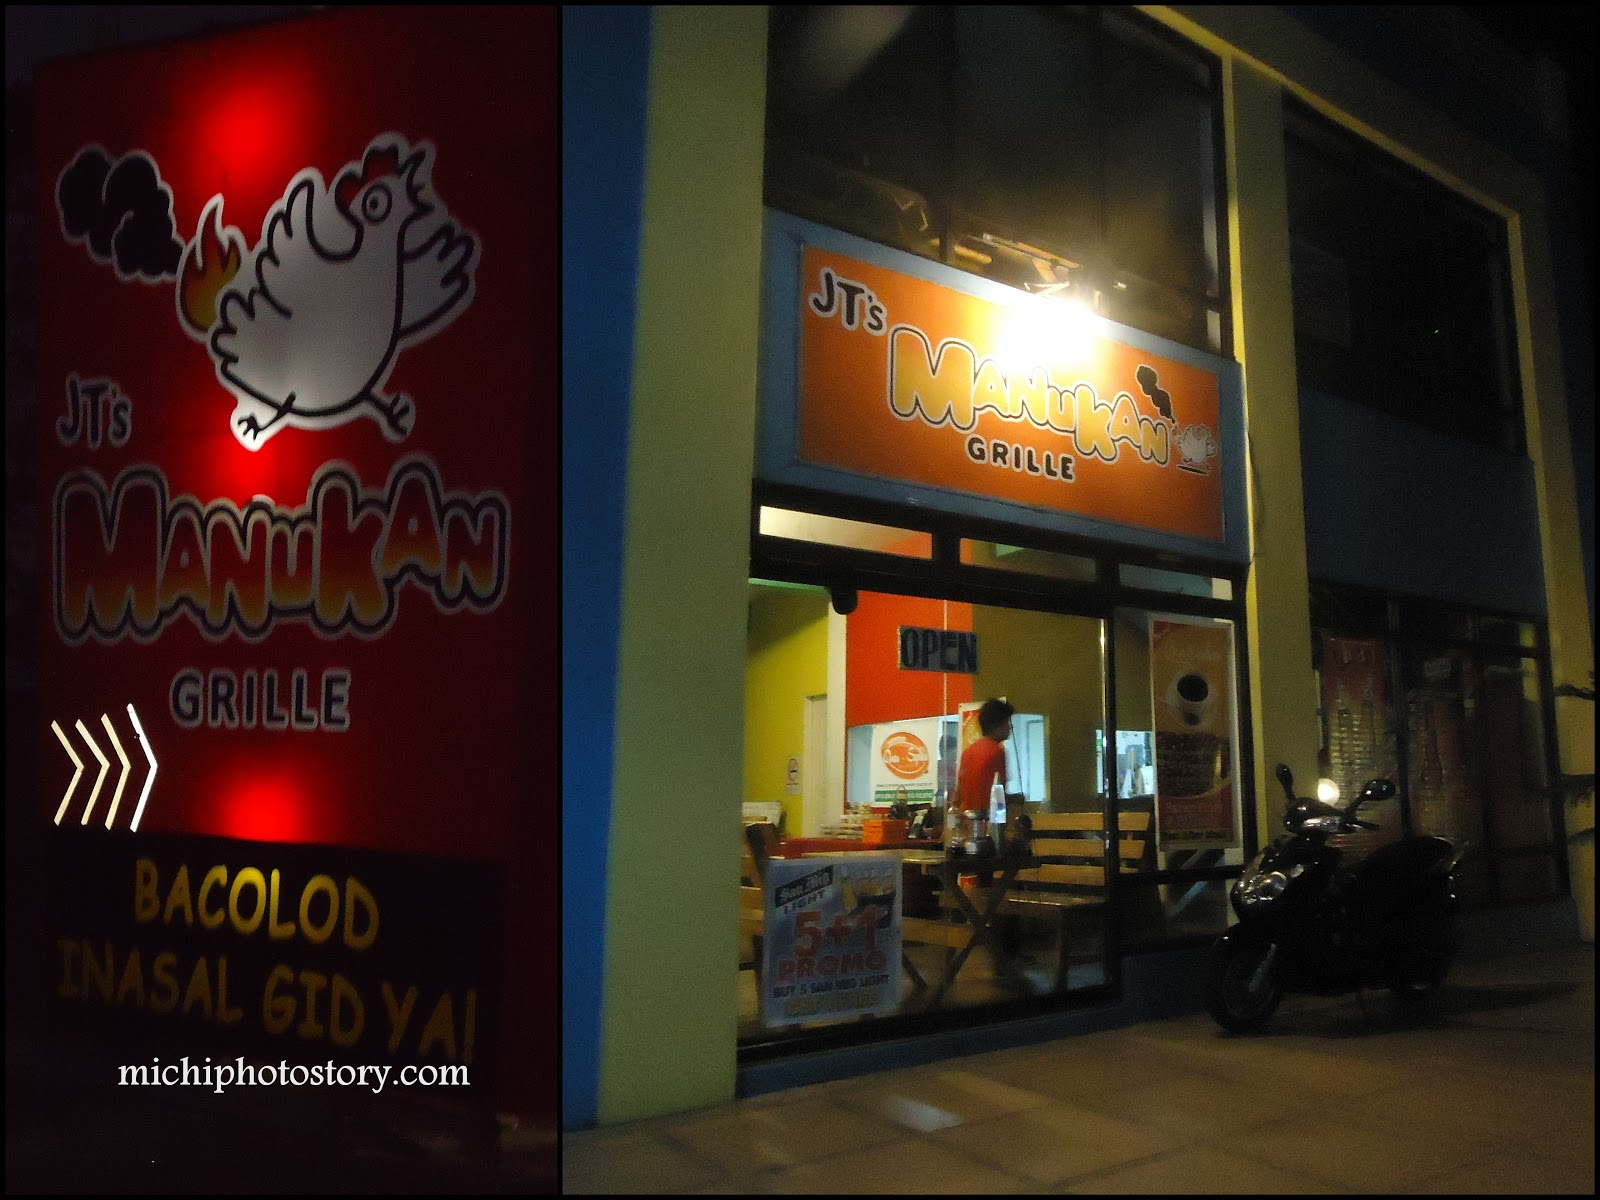 Michi Photostory Jt S Manukan Grille